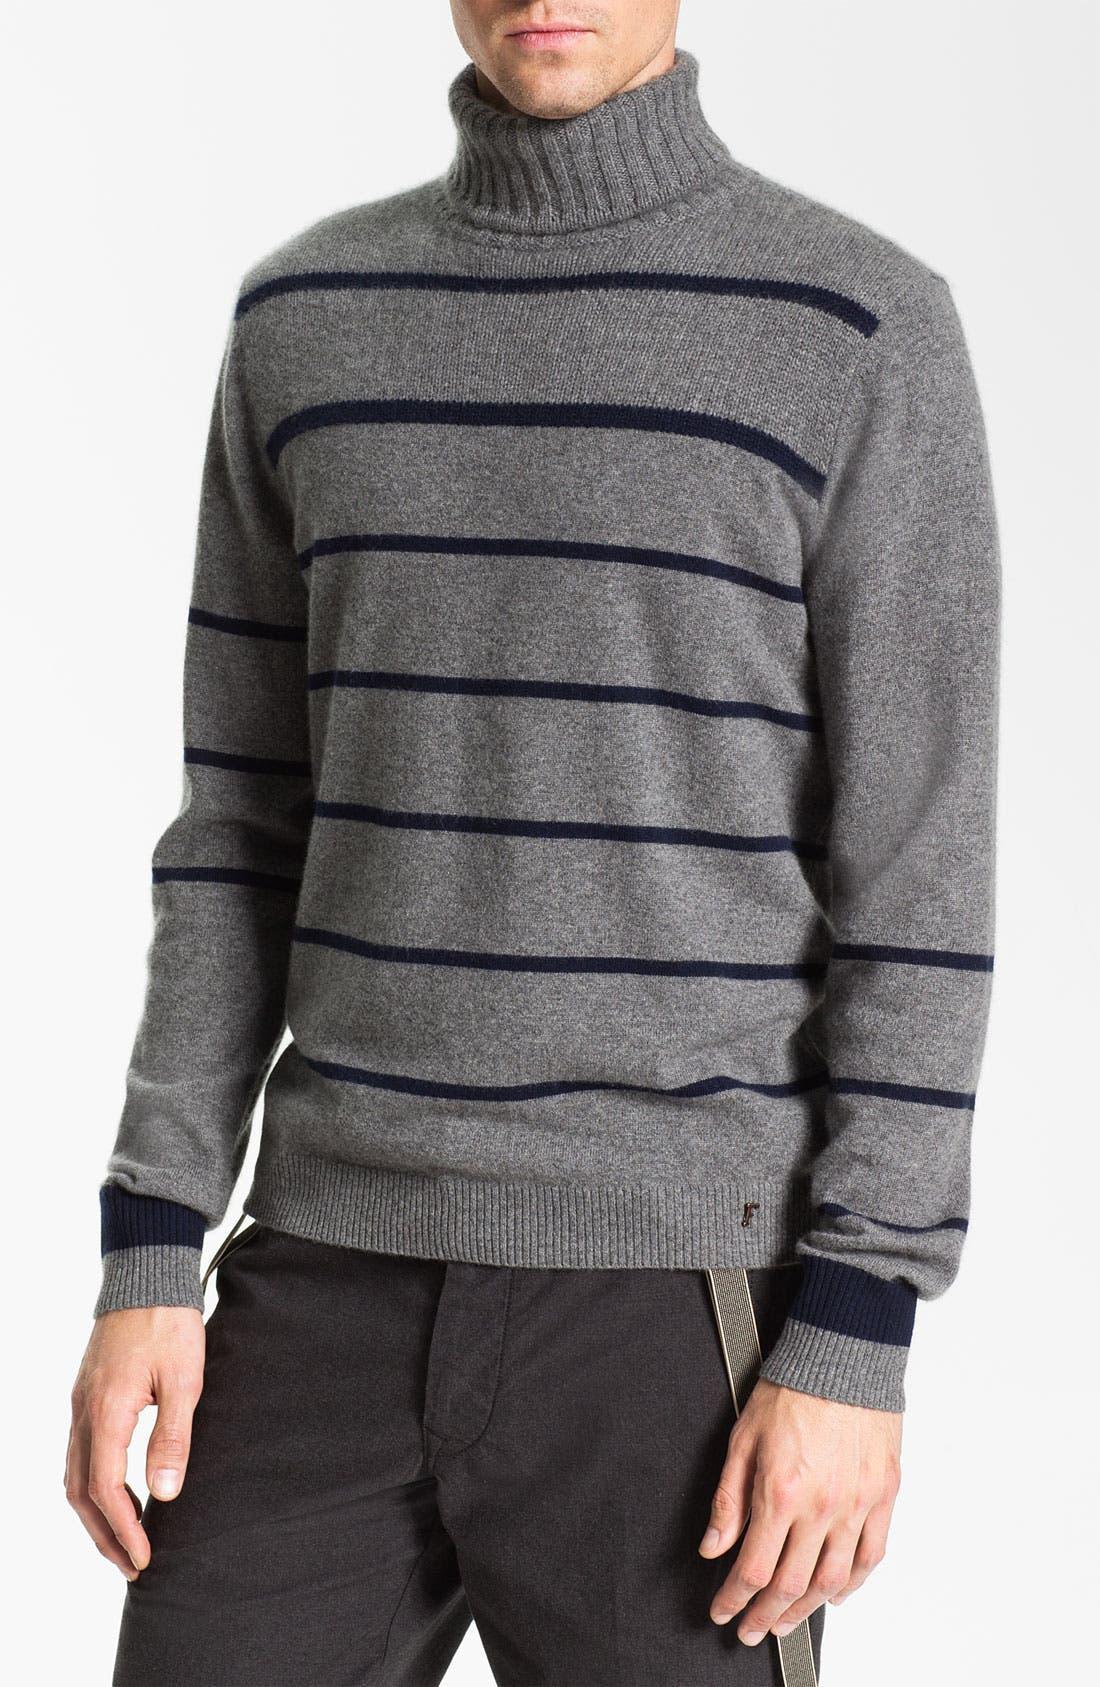 Alternate Image 1 Selected - Façonnable Cashmere Turtleneck Sweater